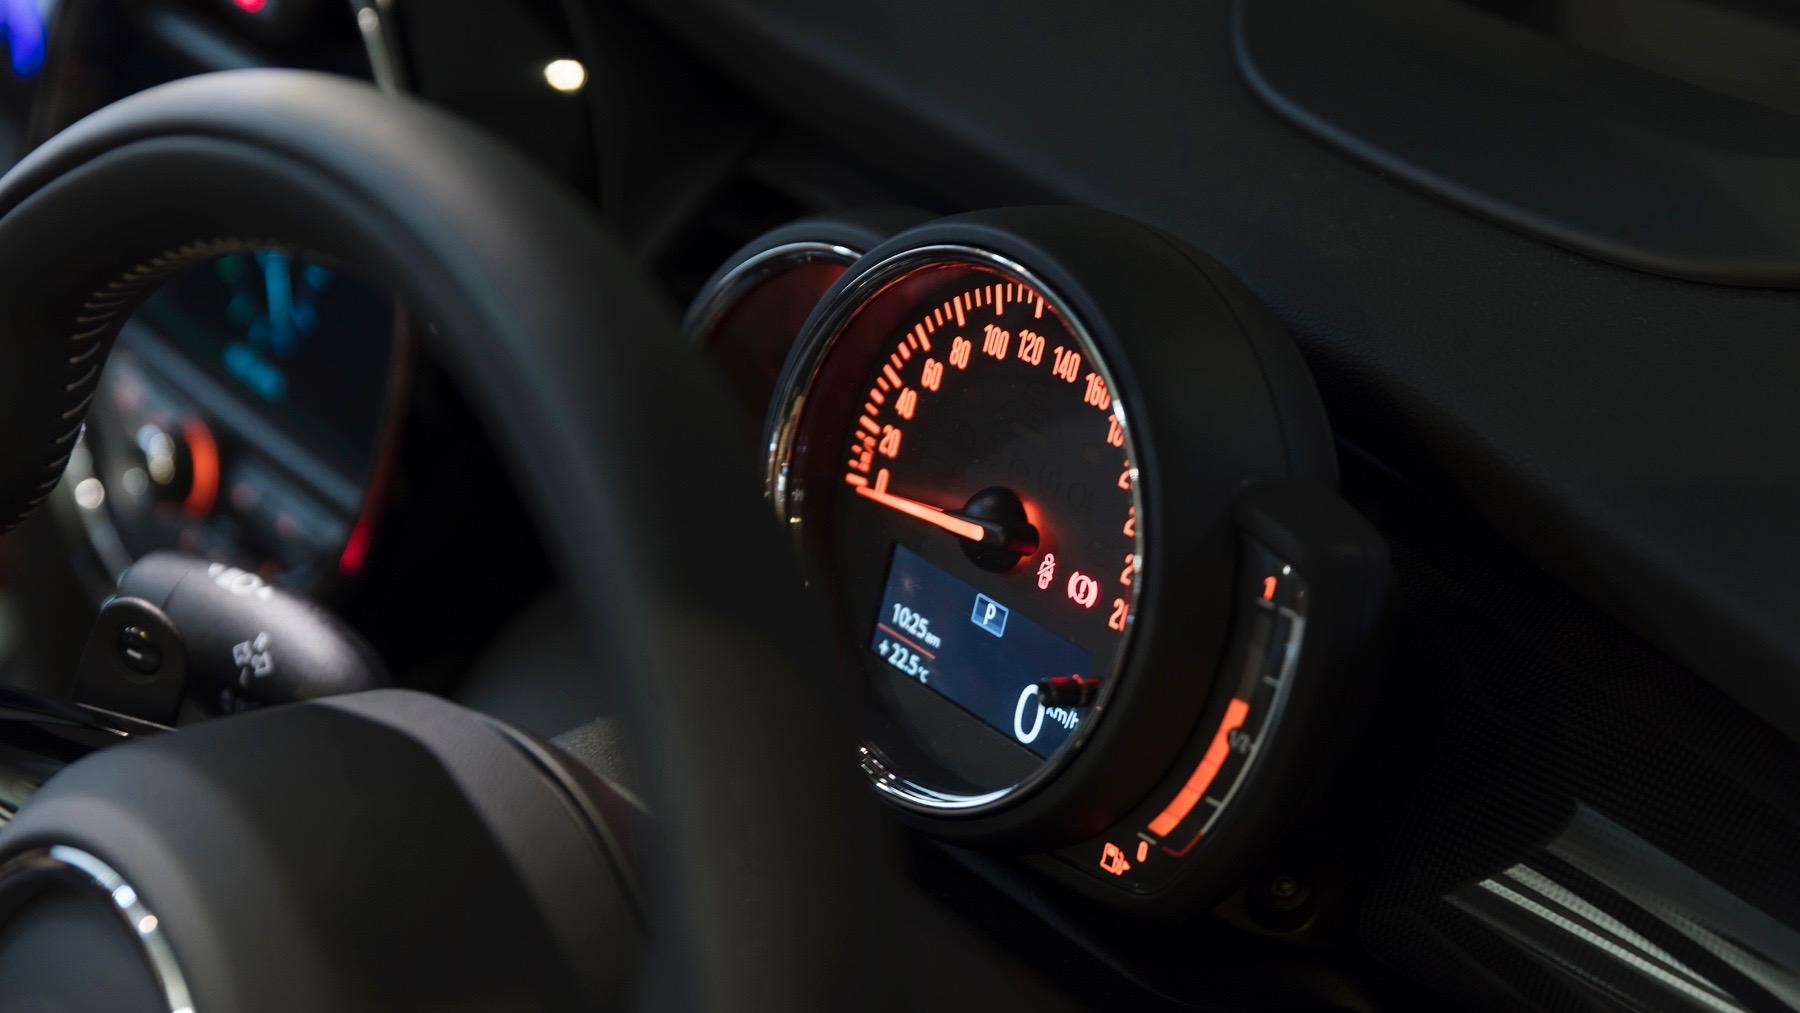 2018 MINI Cooper S speedometer